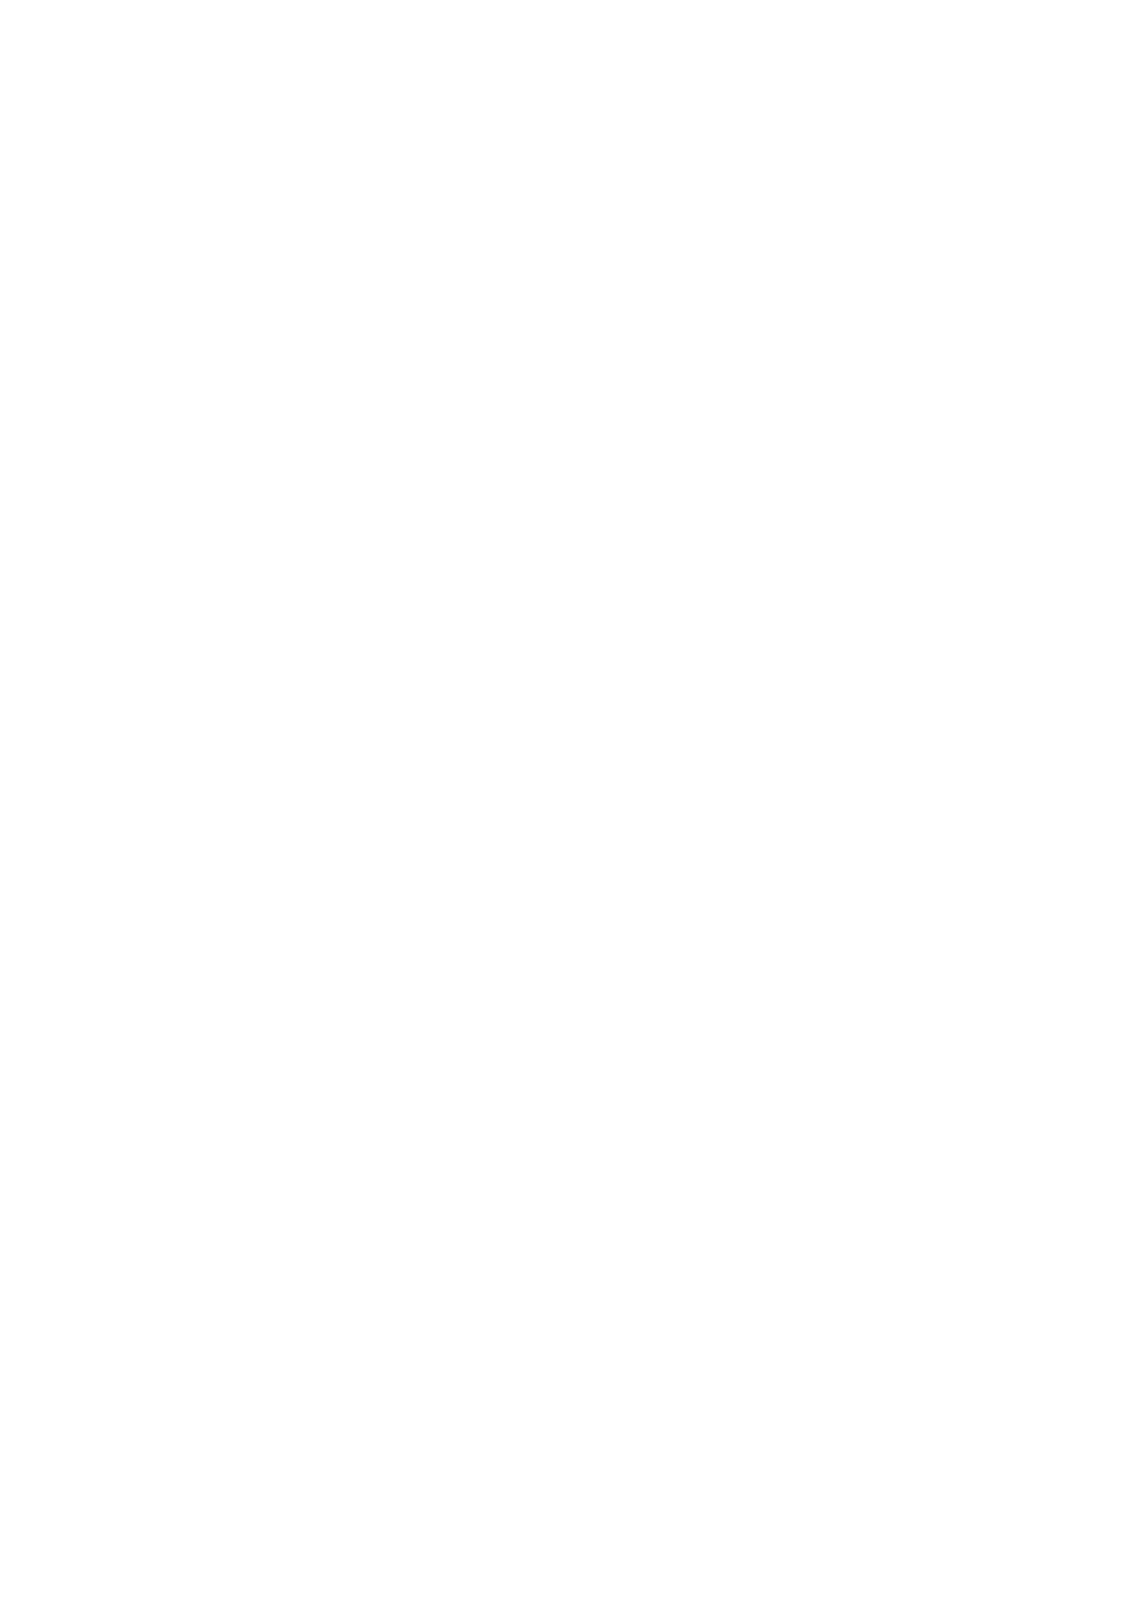 [Nihohuhehon (Supurai)] WhiteBrim Royal Maid-tai no Kenshin-Tekina Aijou o Zonbun ni Ajiwau Hon | WhiteBrim: An Appreciation Book to The Devoted Love of Royal Maid Corp (Azur Lane) [English] [Night Revenants] [Digital] 25